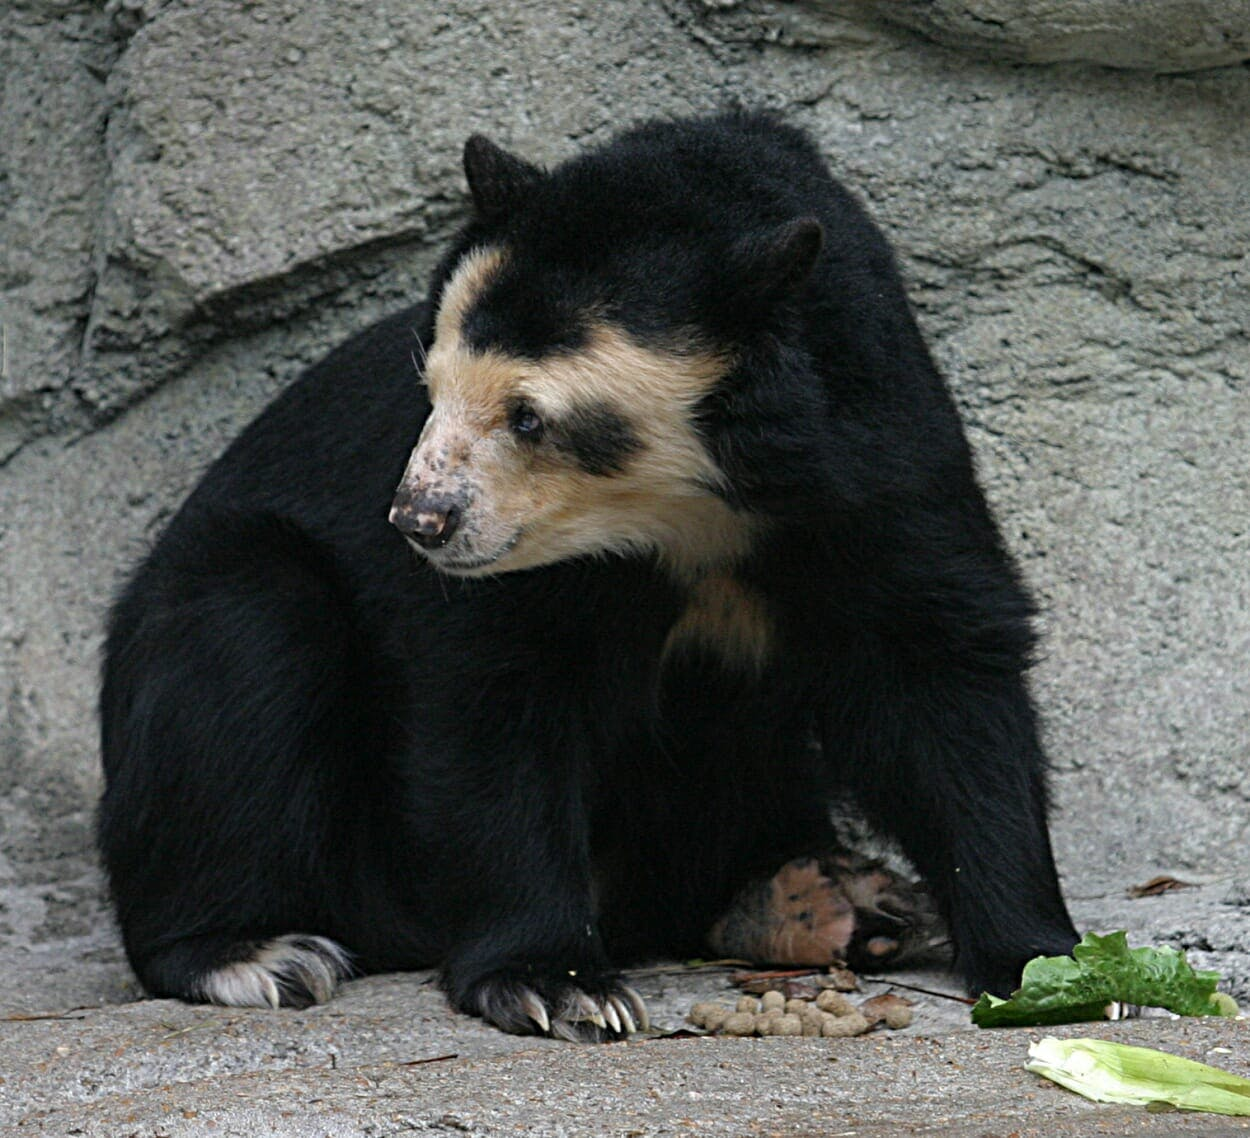 Spectacled_Bear_-_Houston_Zoo